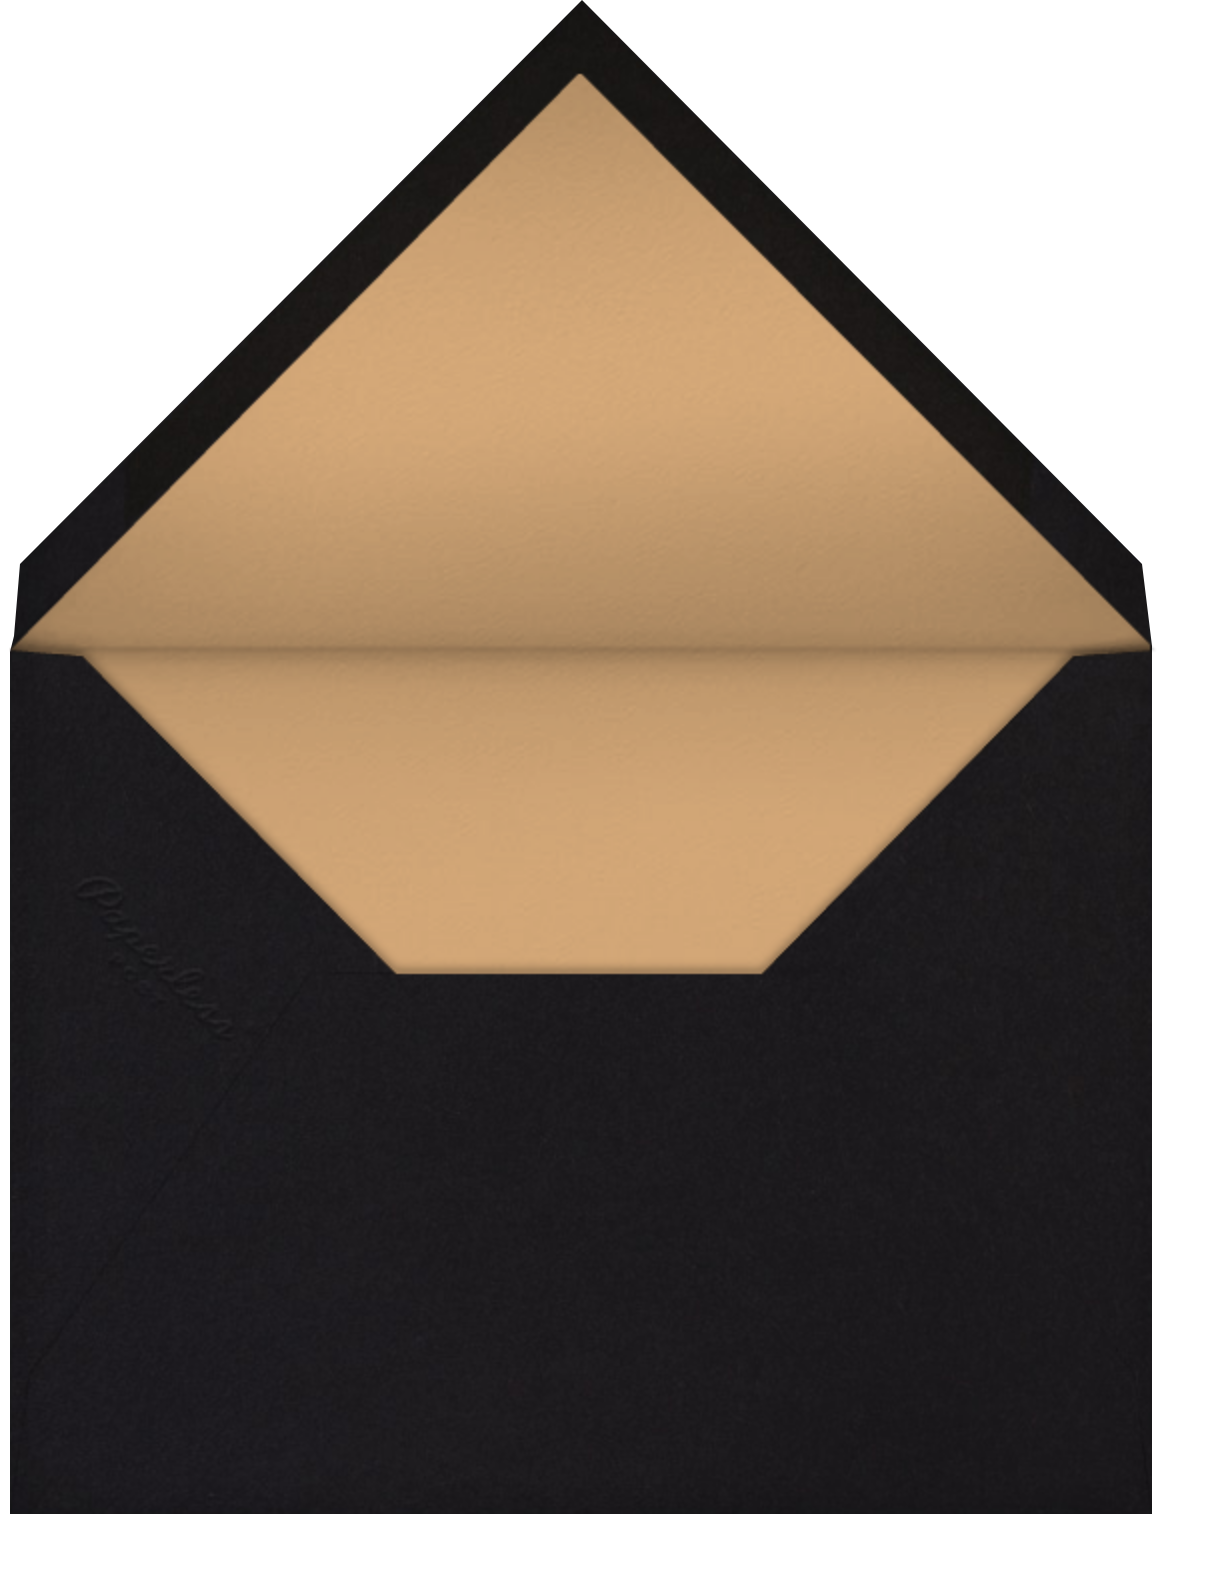 A Cheesy Card - Derek Blasberg - Envelope